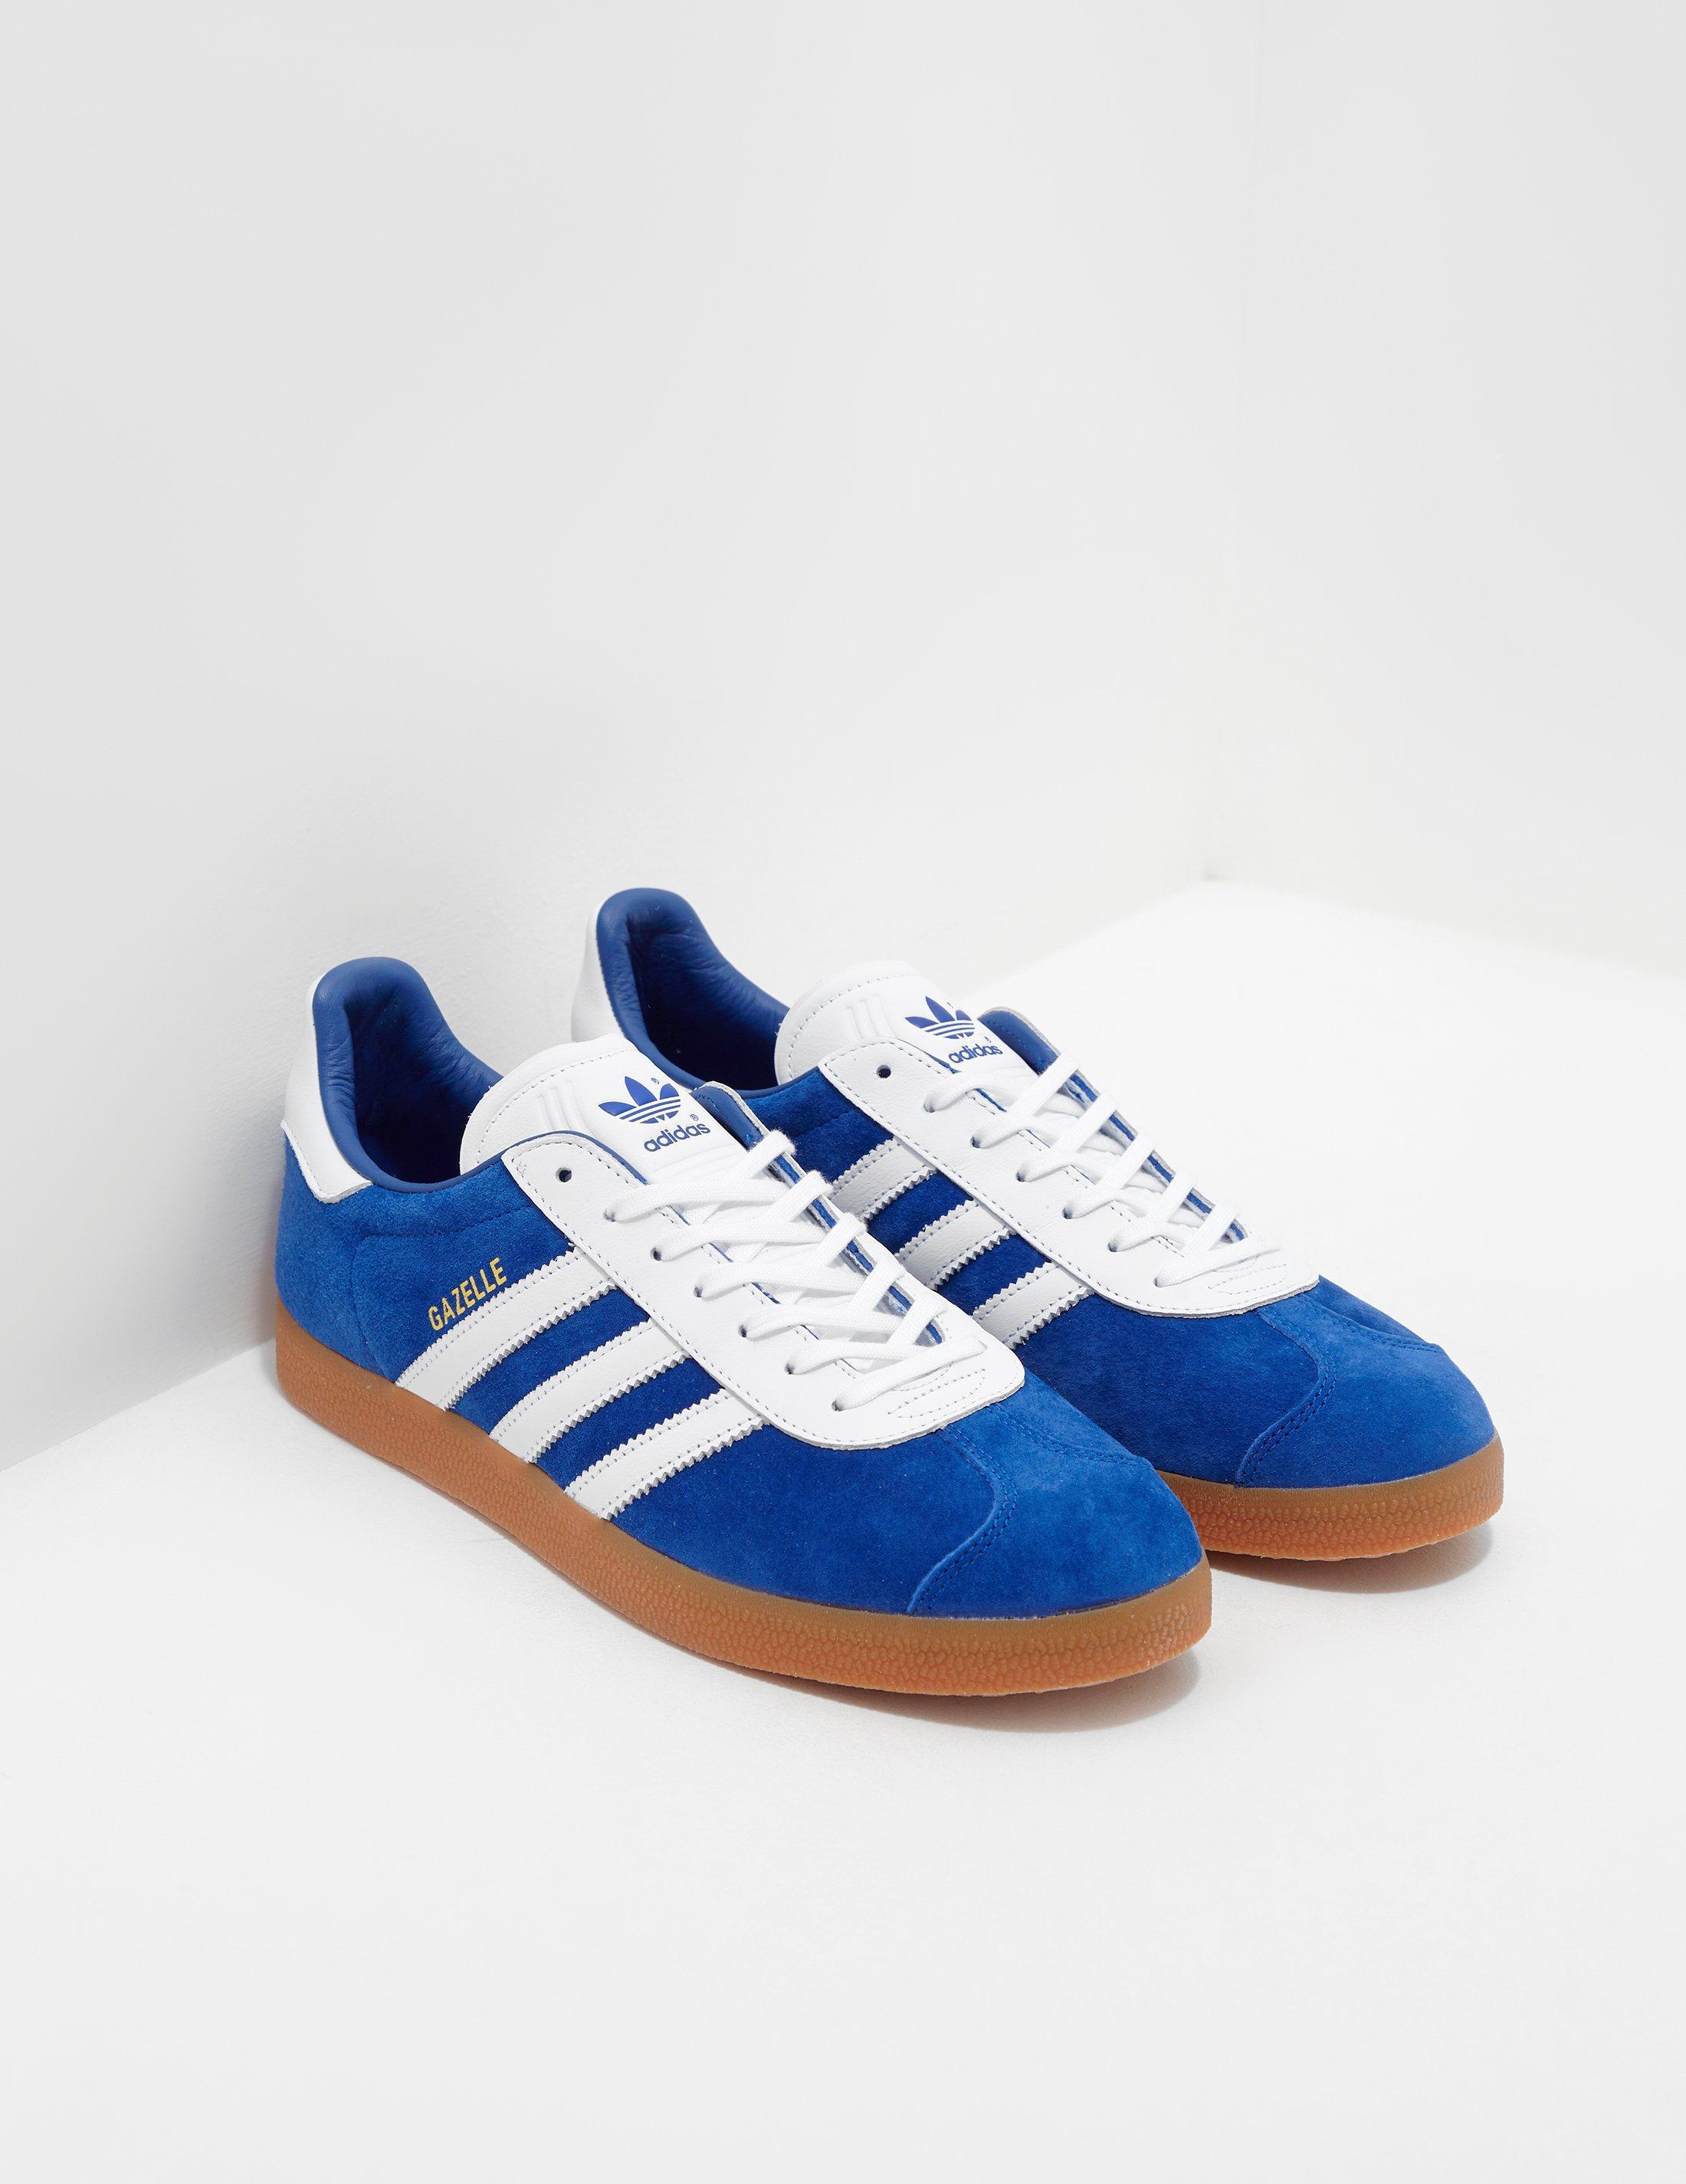 timeless design f2b92 3f5d0 adidas Originals. Mens Gazelle Blue